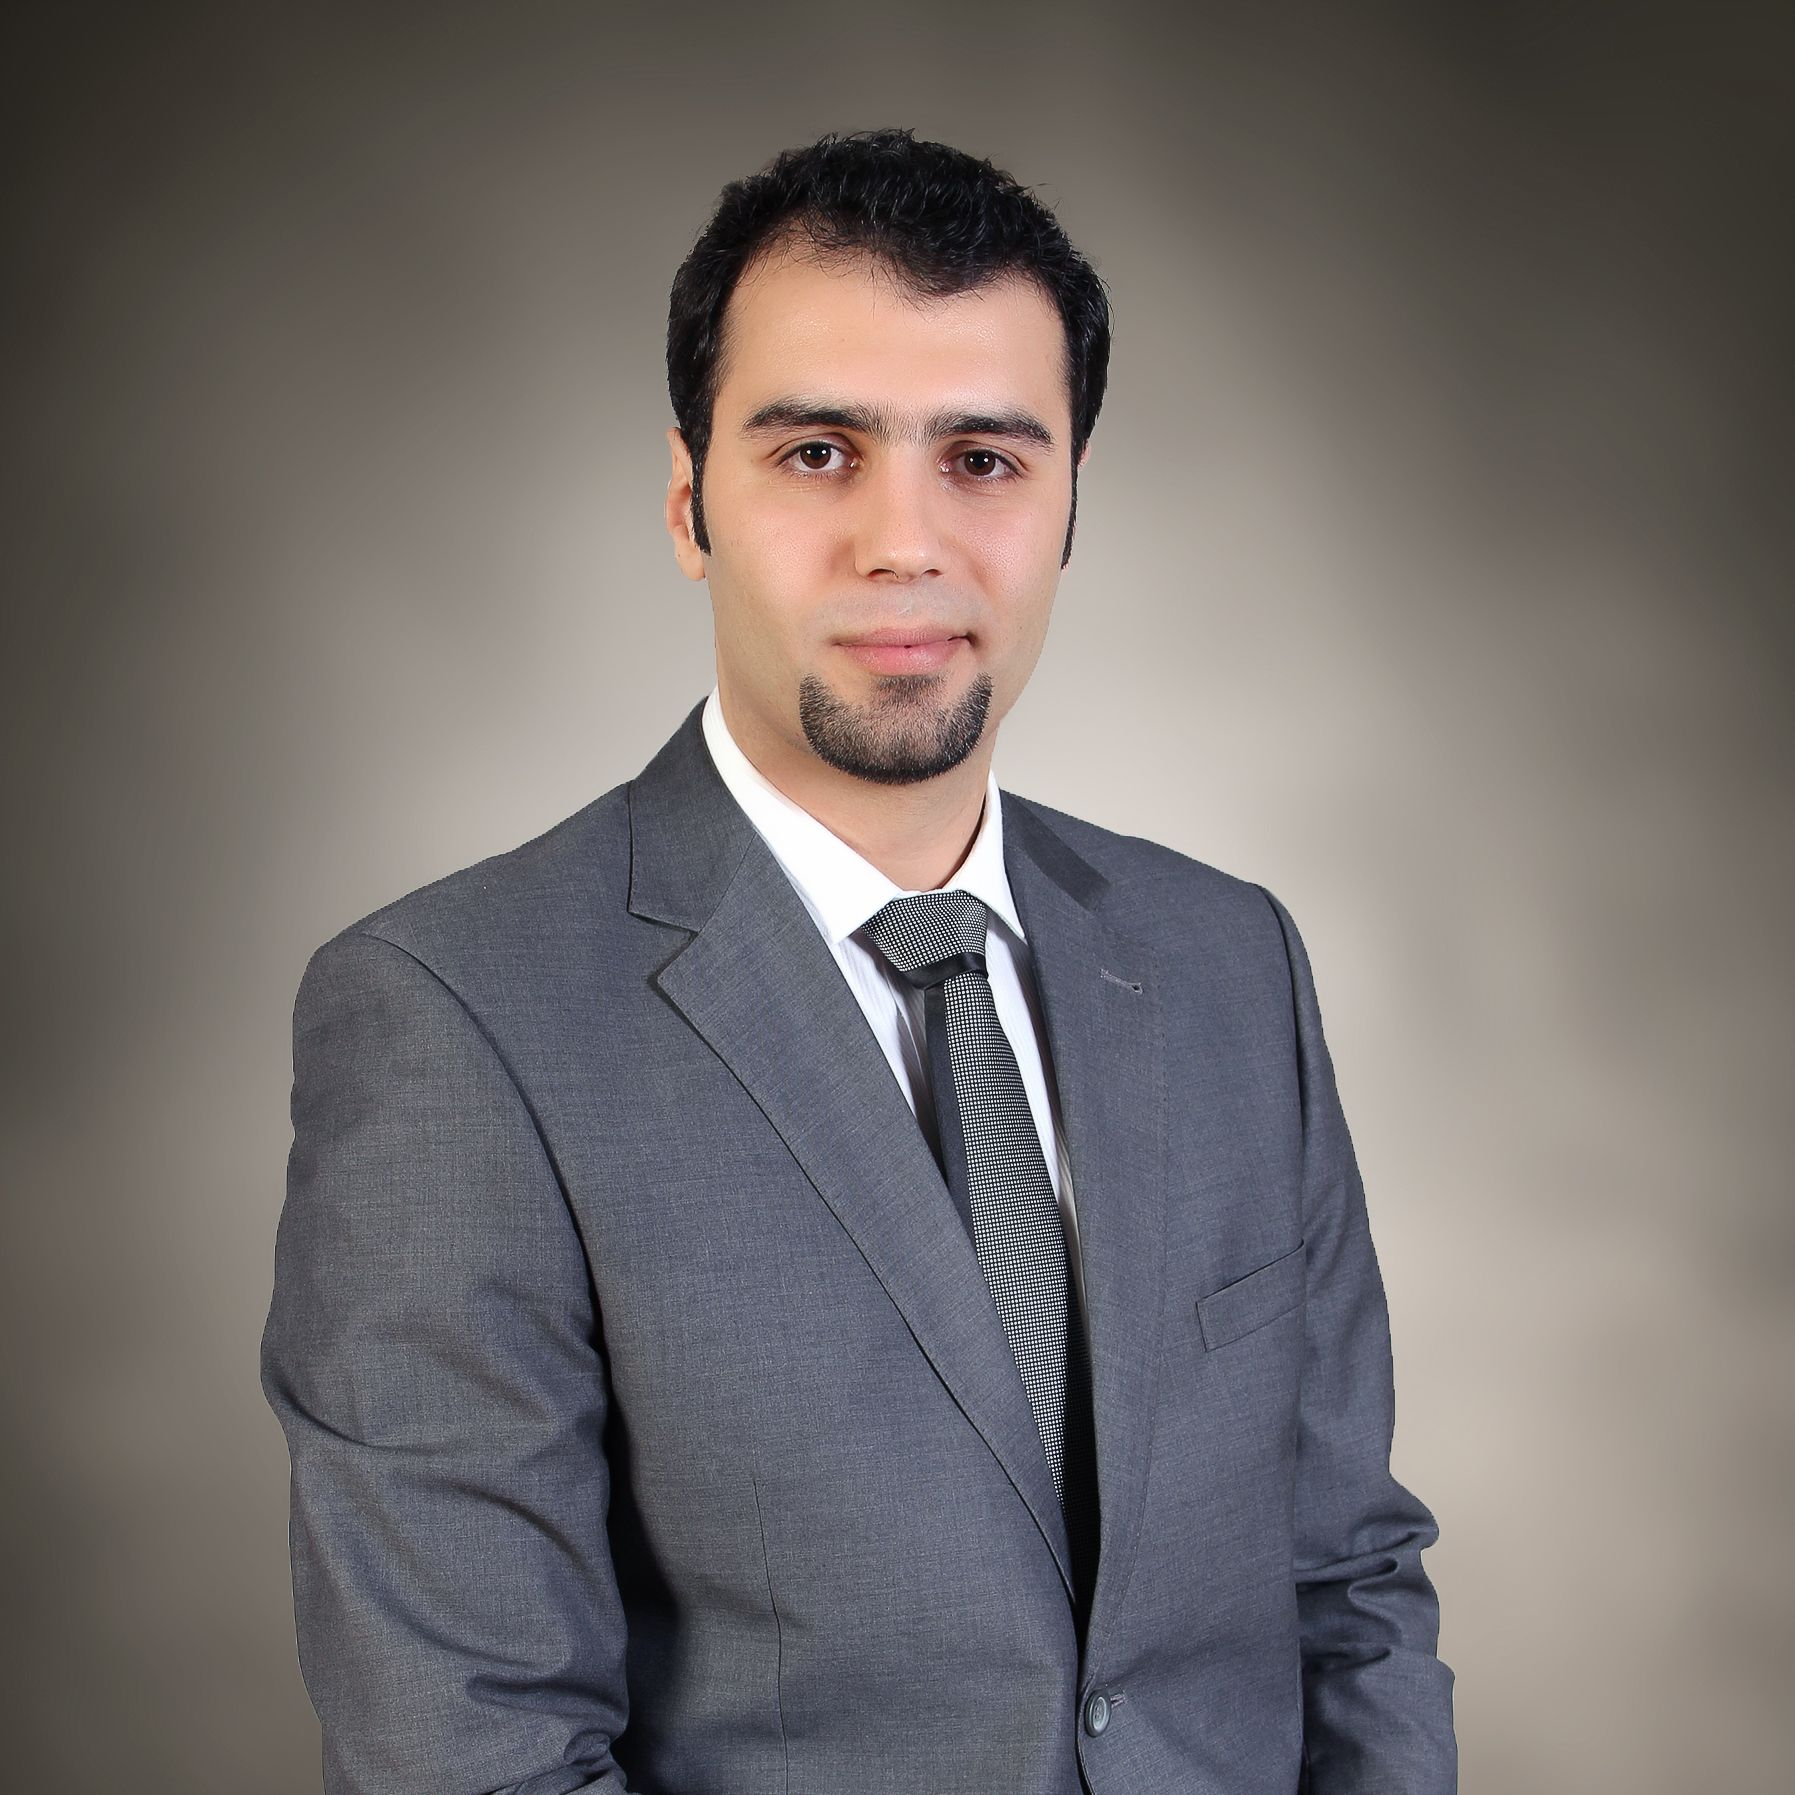 Mouhamd Rami Issa